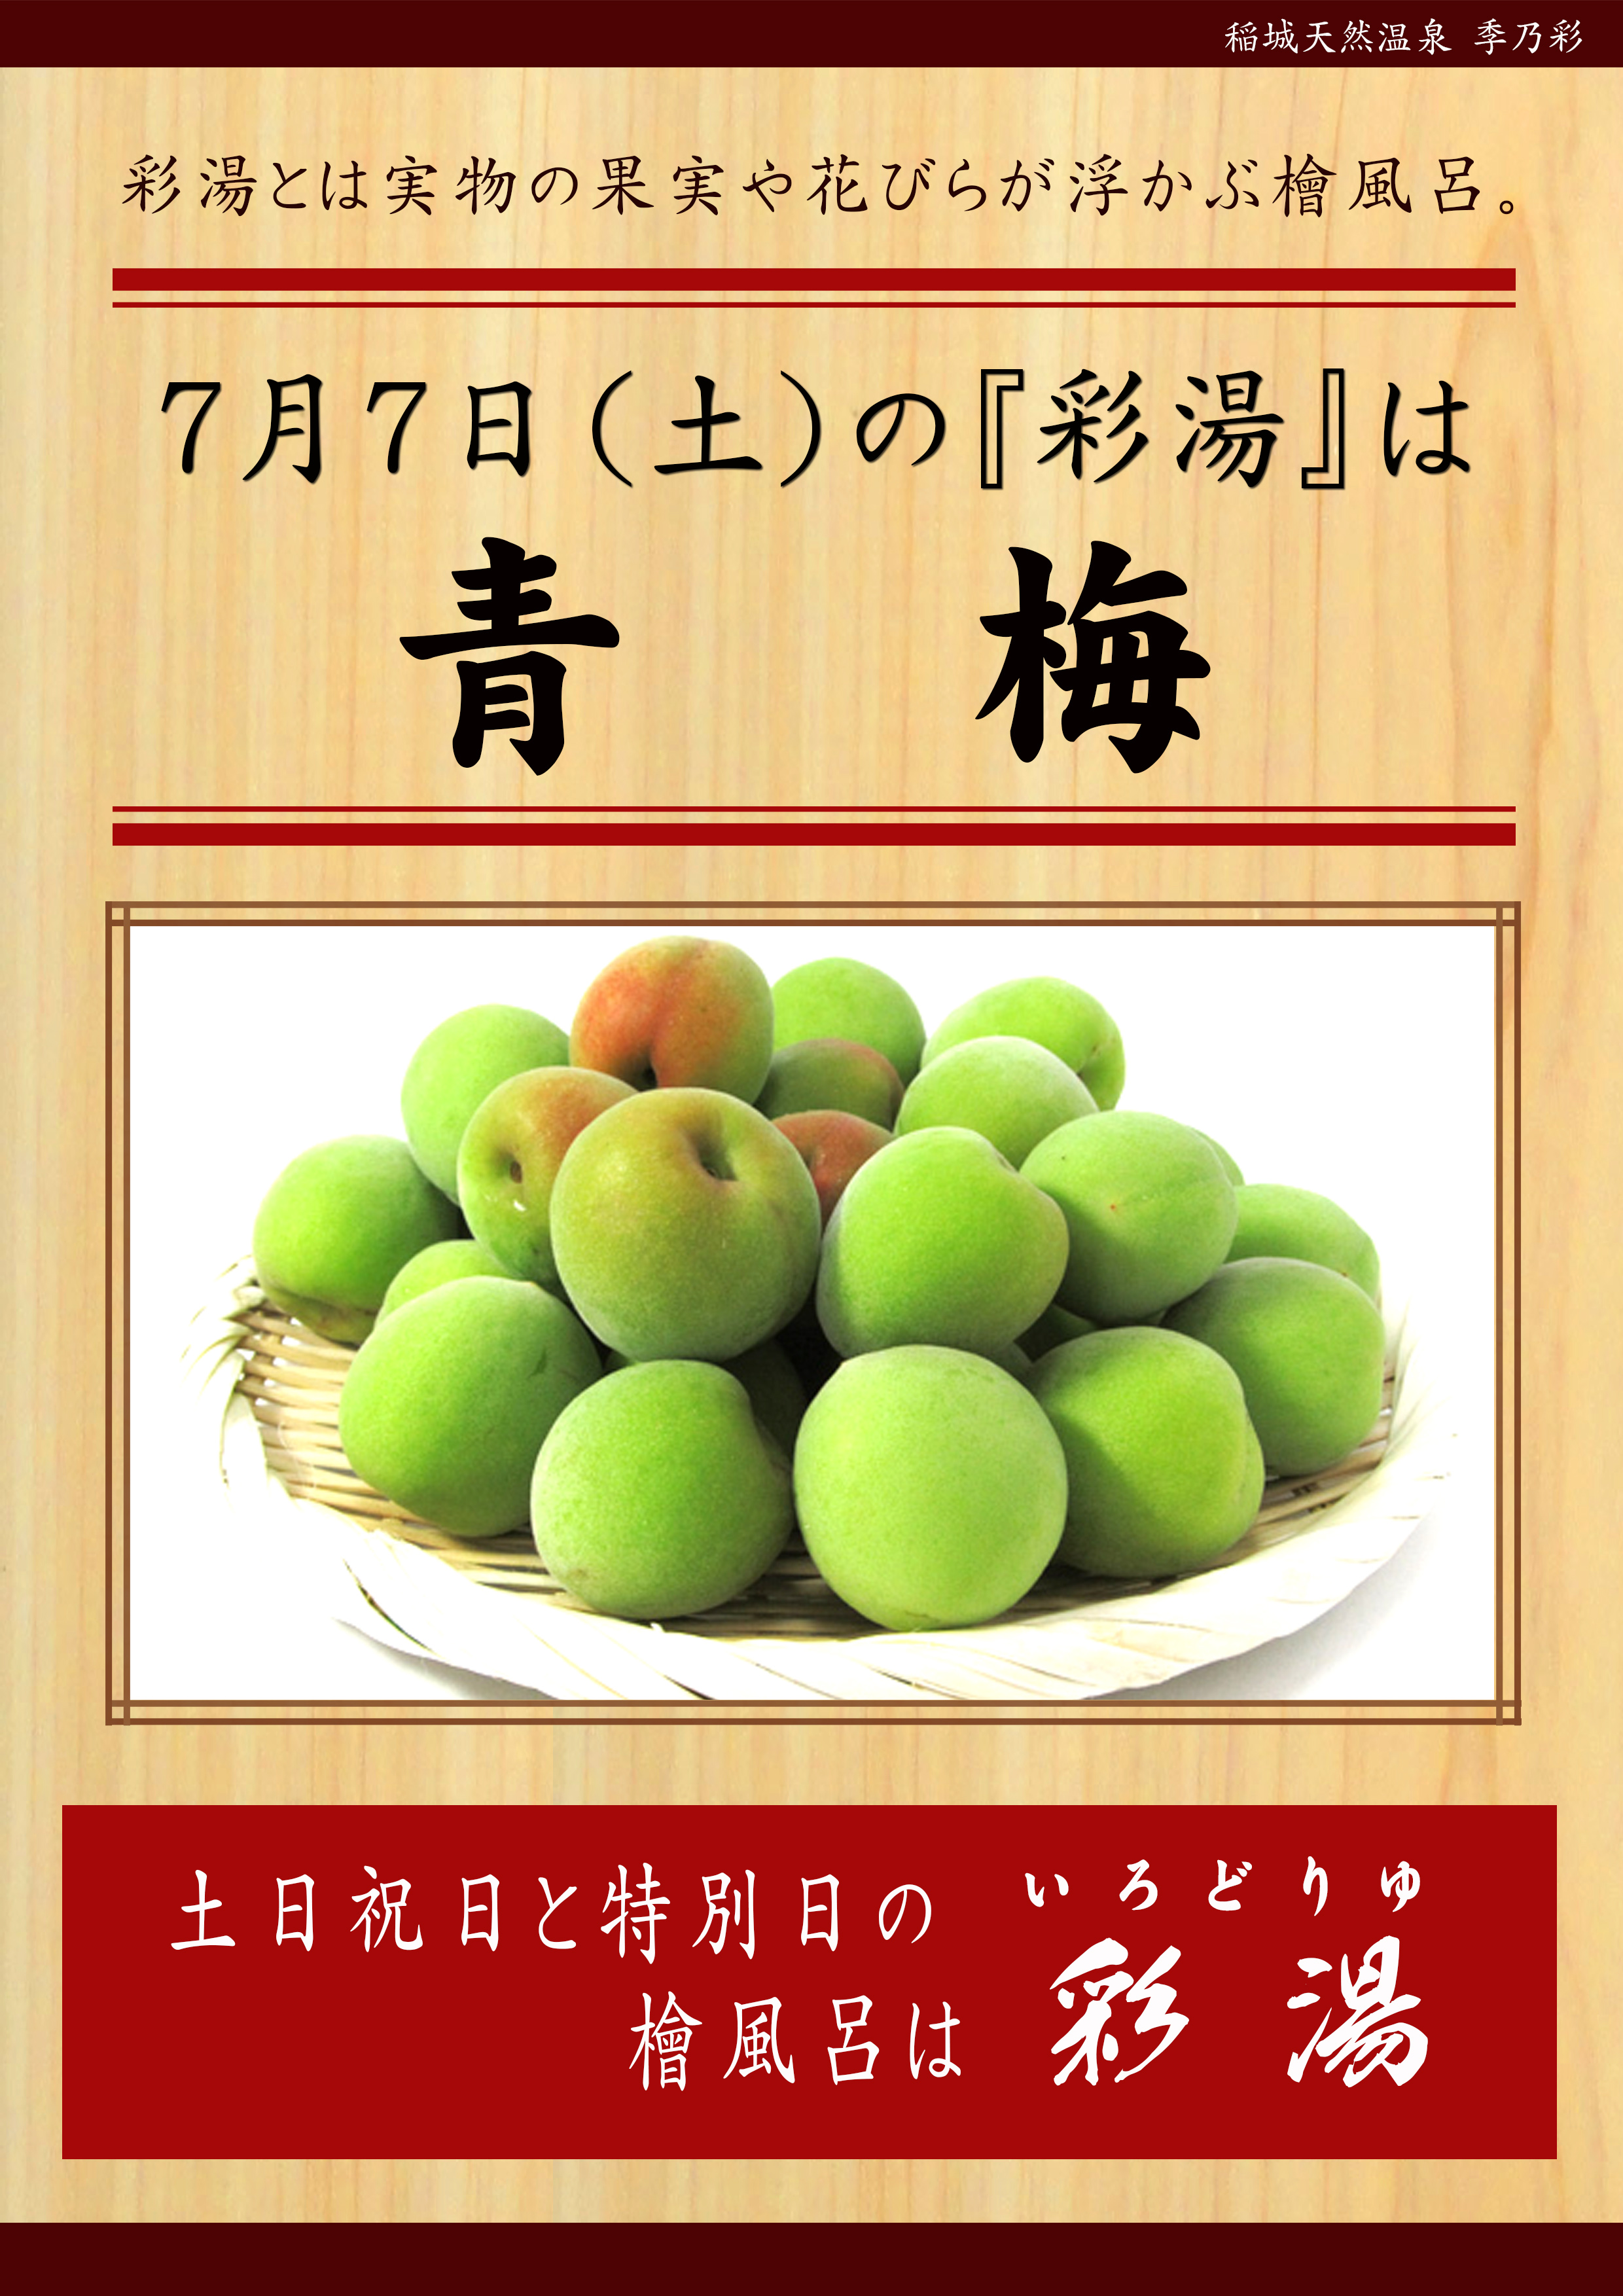 20180707POP イベント 彩湯 青梅